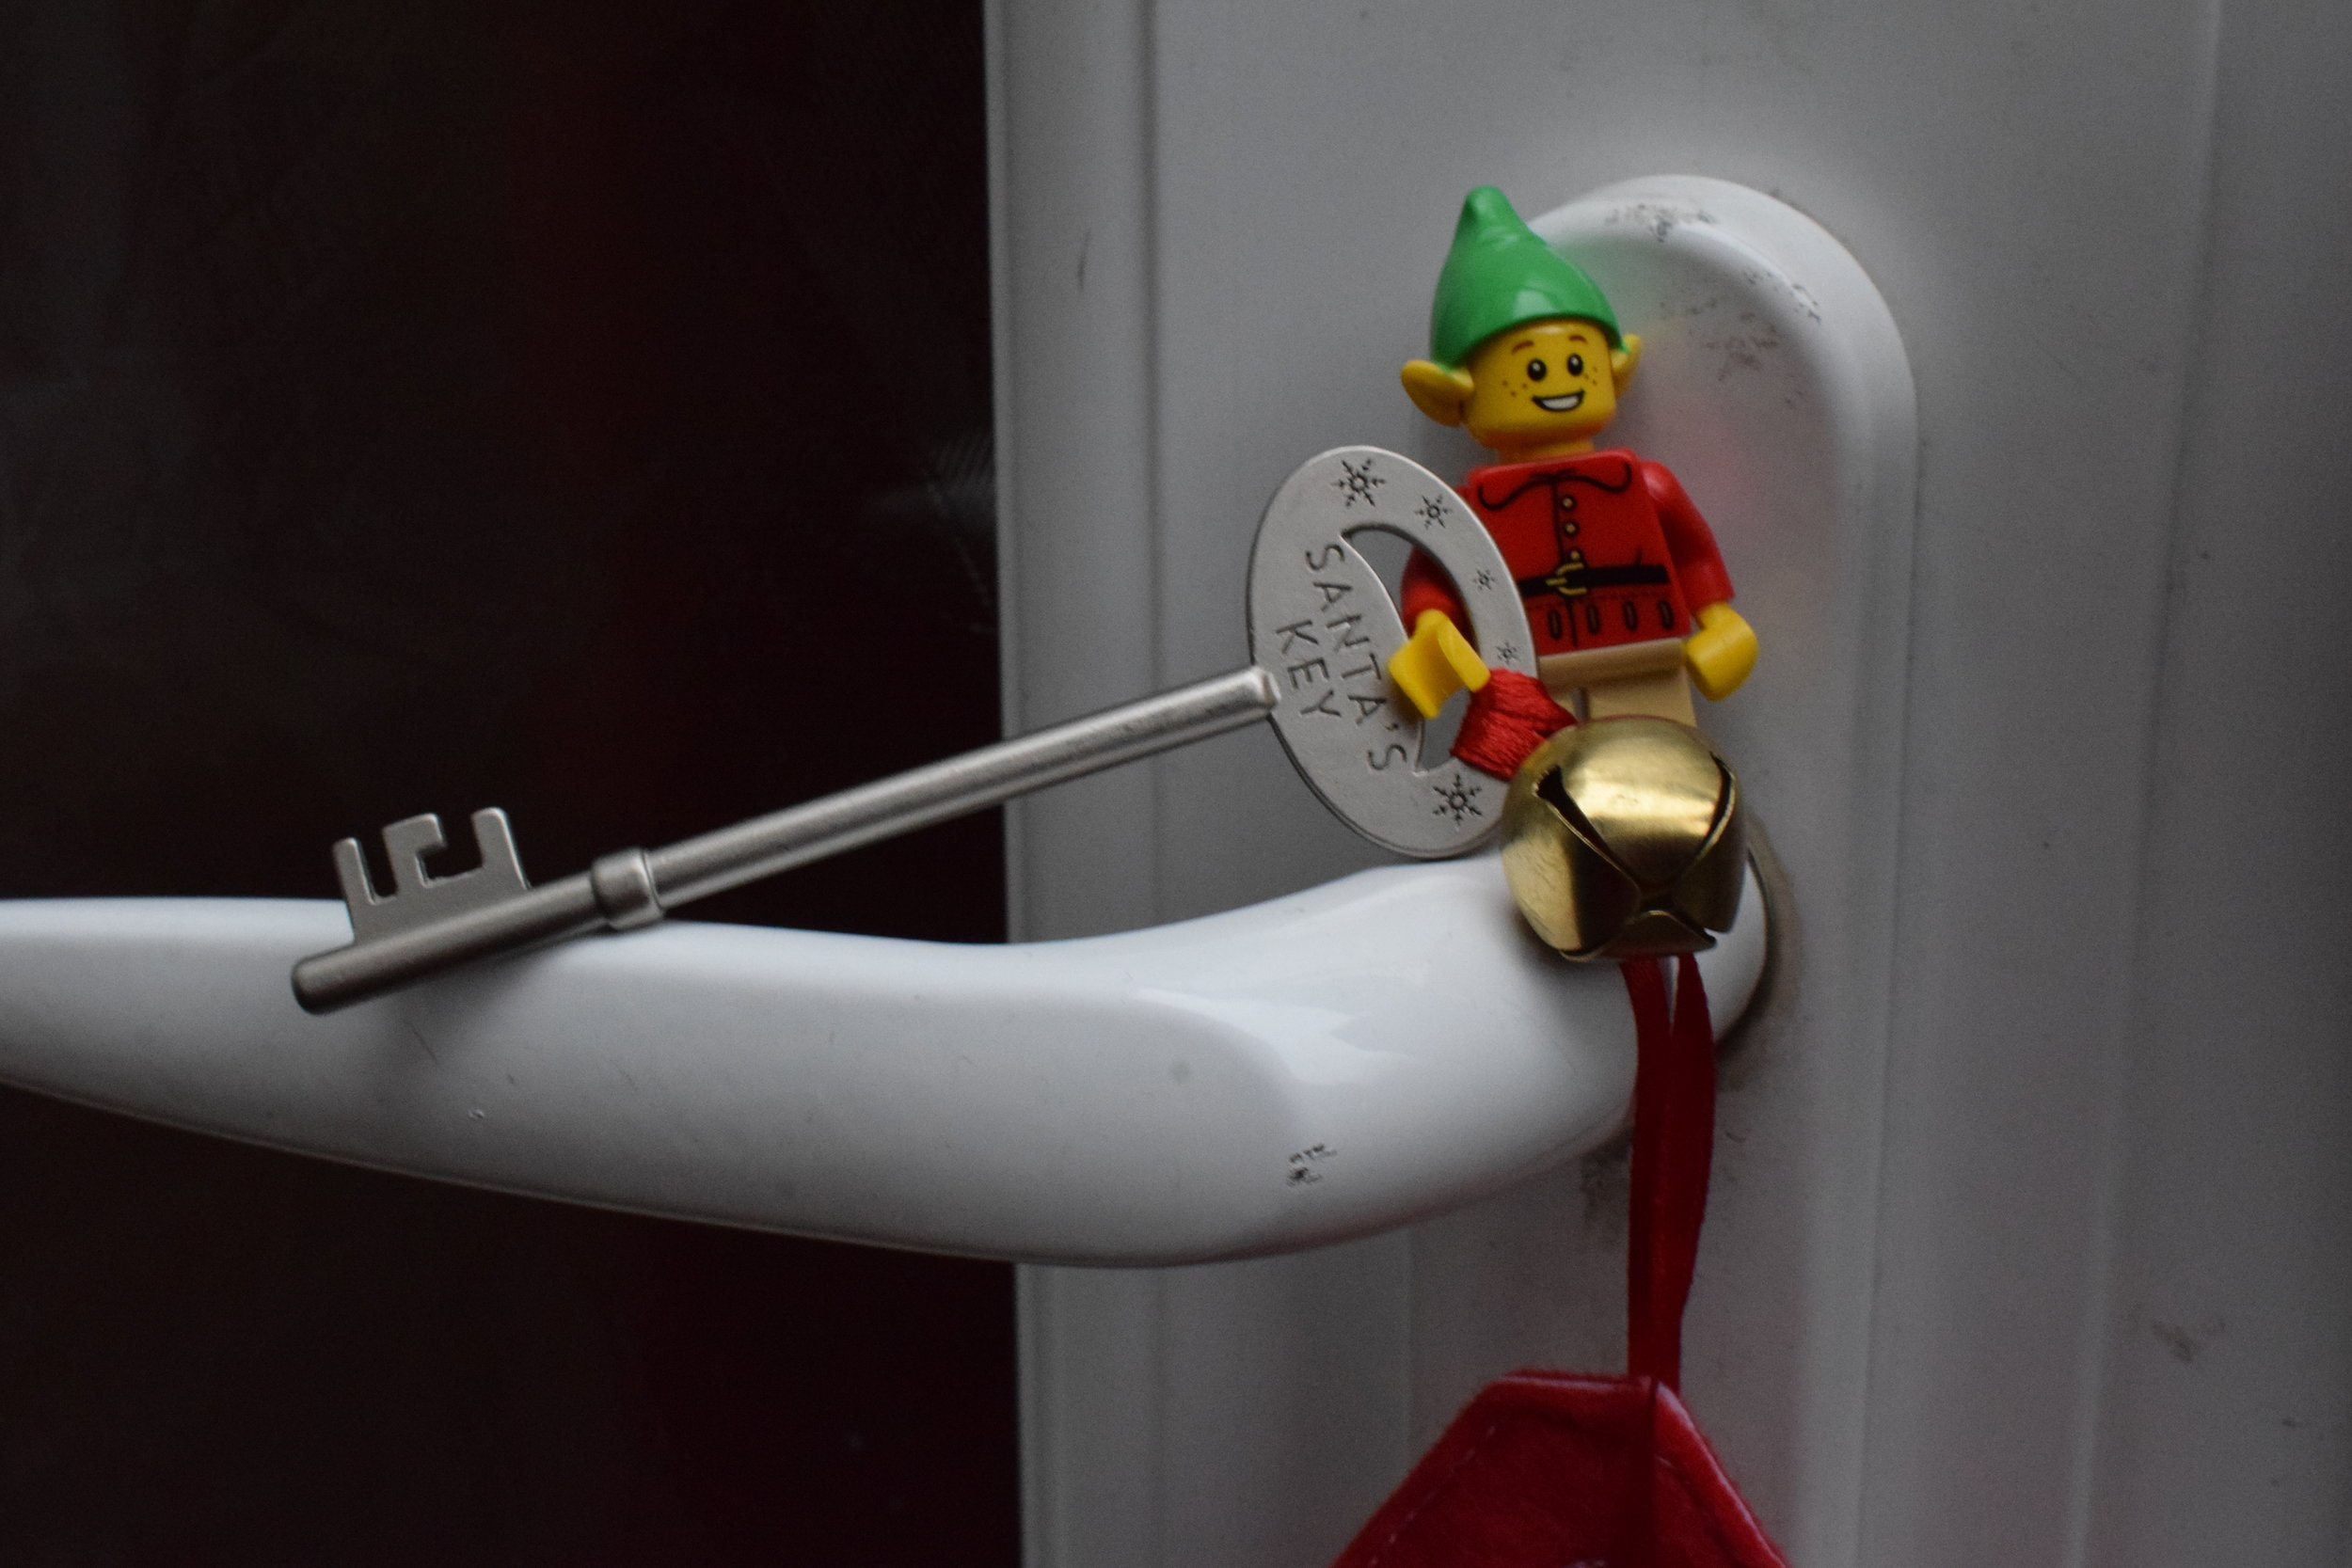 Lego elf and Santa's magic key